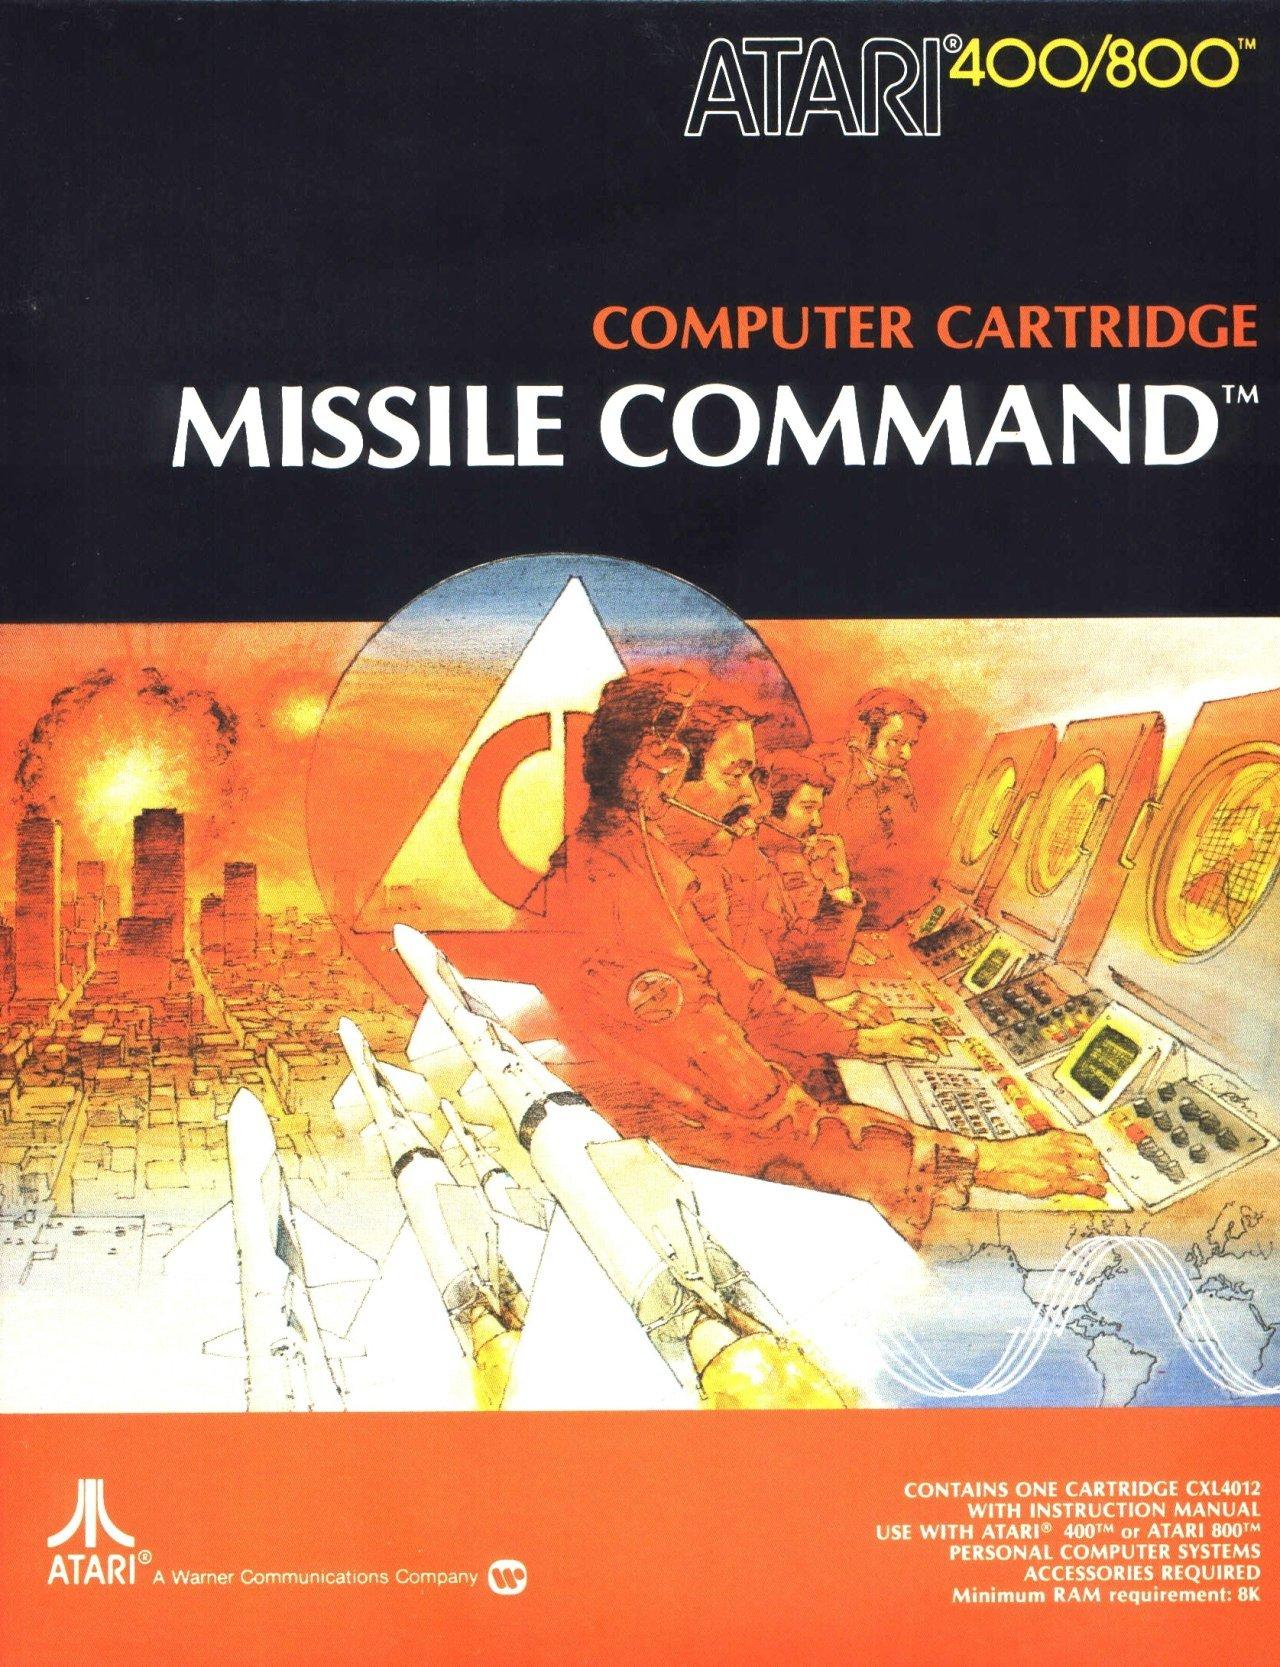 Missile Command (Atari 400/800) – Megalextoria on berzerk atari, defender atari, solaris atari, combat atari, astroblast atari, adventure atari, bosconian atari, plaque attack atari, wizard of wor atari, mappy atari, breakout atari, pacman atari, e.t. the extra-terrestrial atari, aquaventure atari, fatal run atari, warlords atari, pepsi invaders atari, space invaders atari, pele's soccer atari, space war atari,